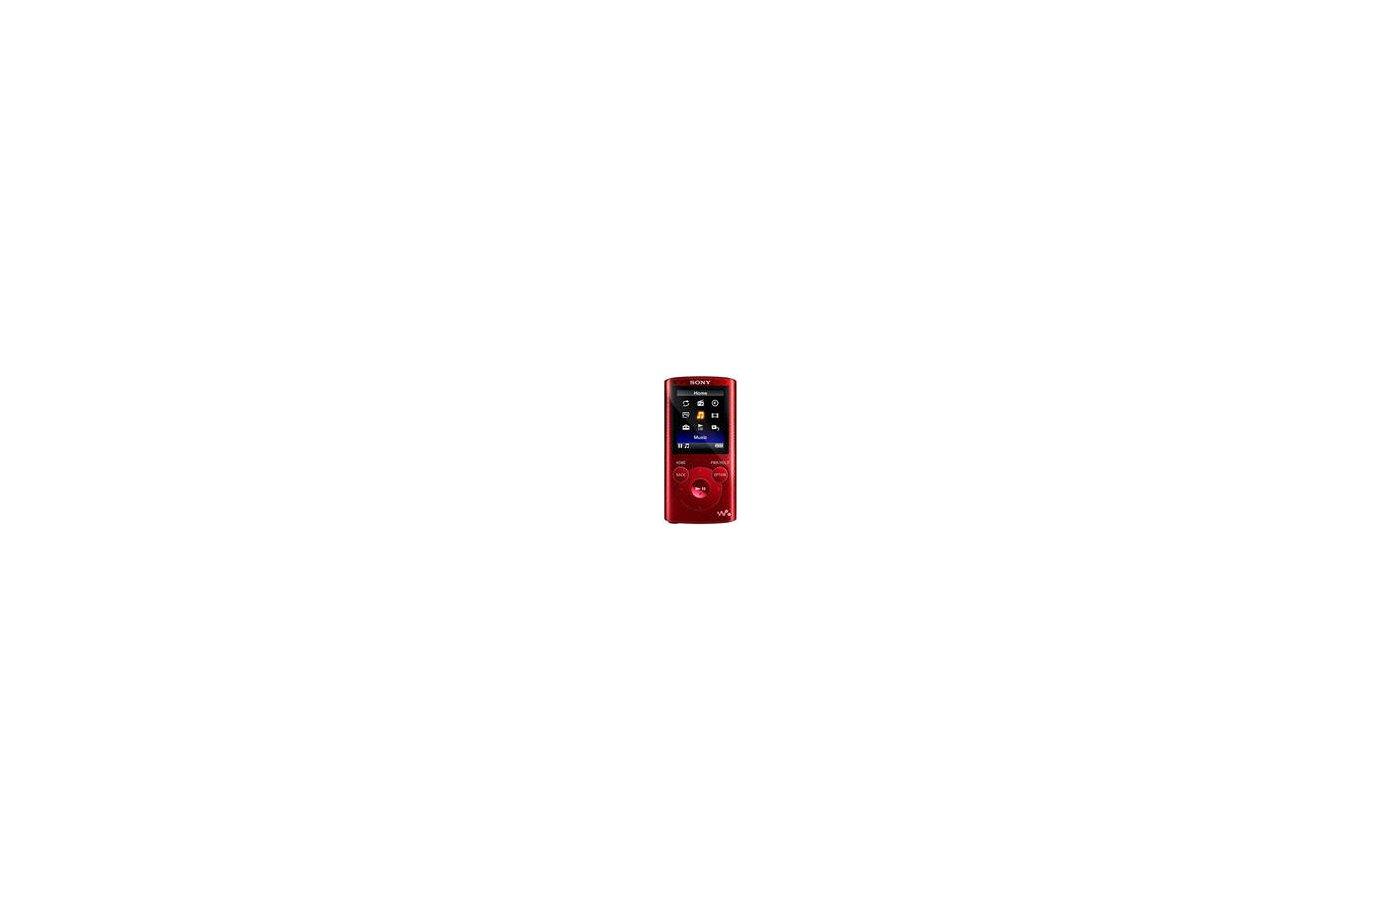 МР3 плеер SONY NWZ-E384 8Gb красный